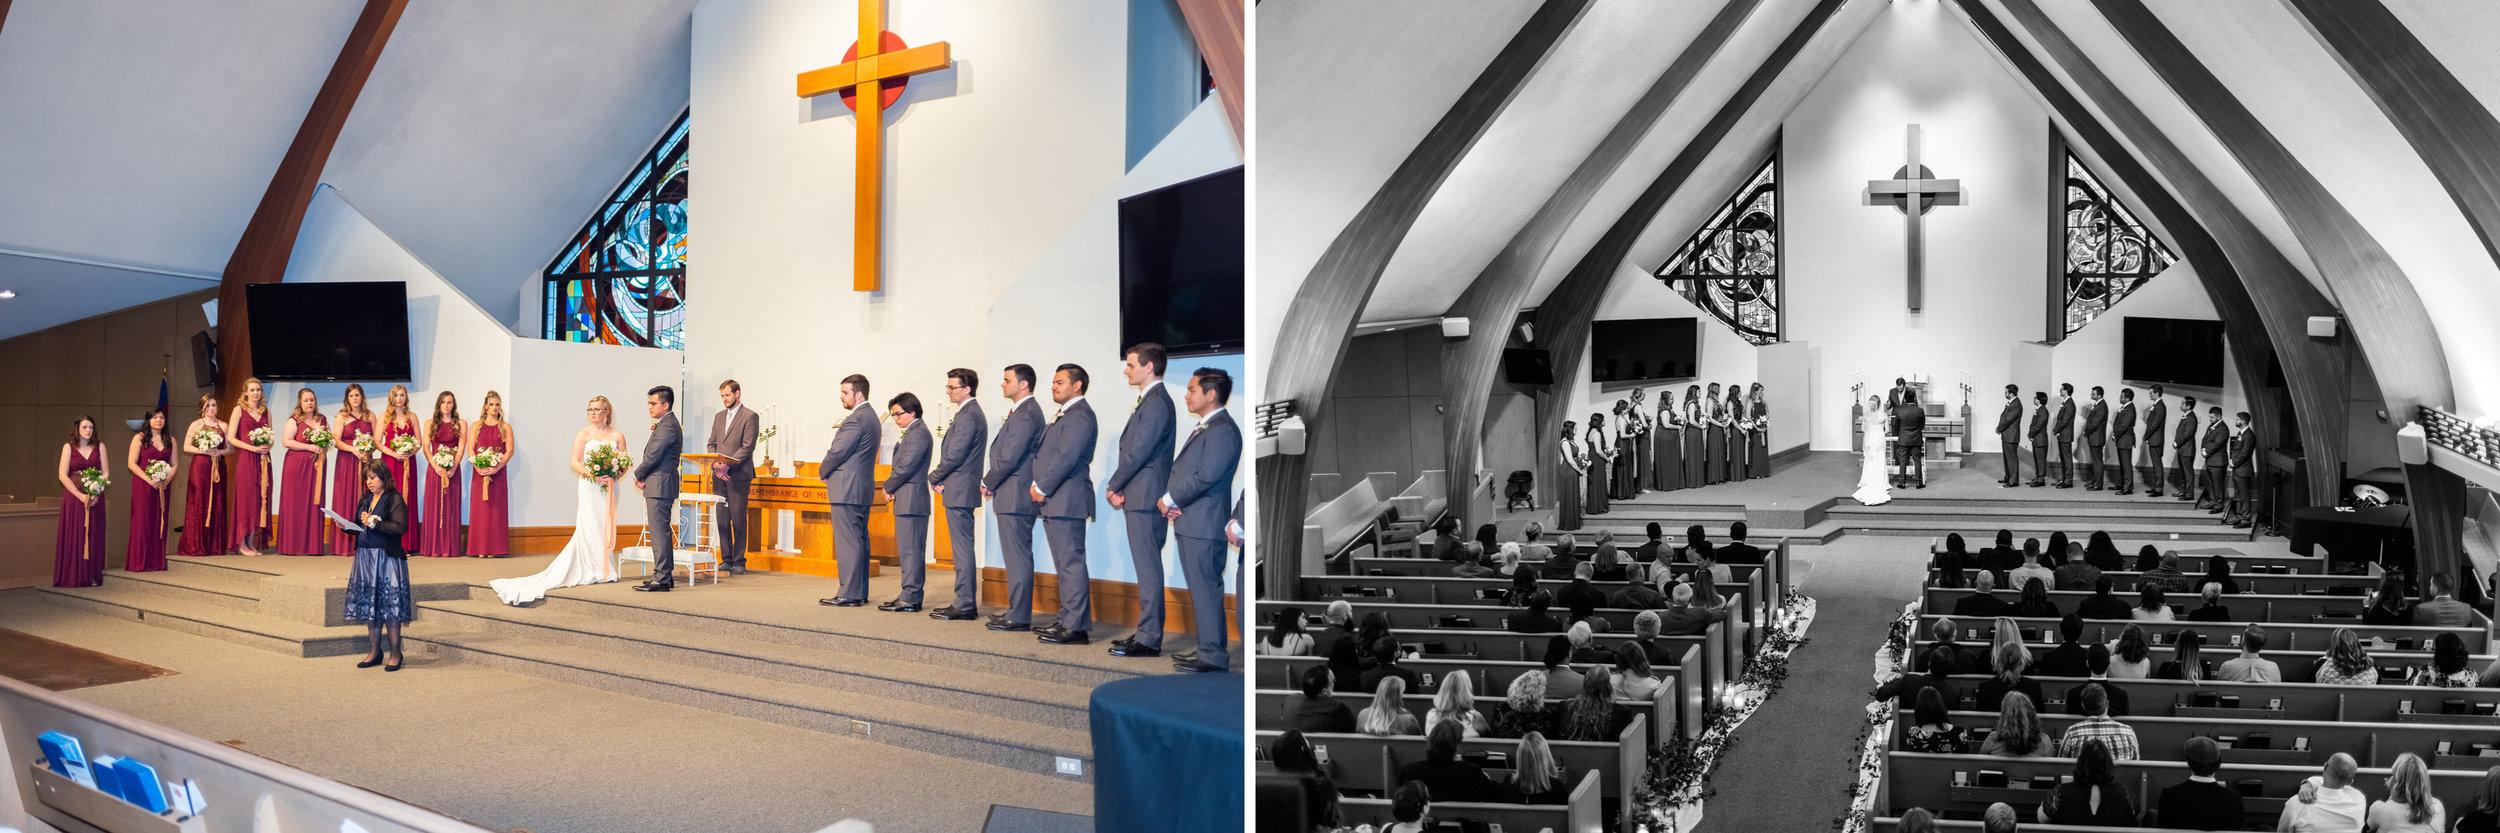 Kansas City Wedding Photographer 62.jpg